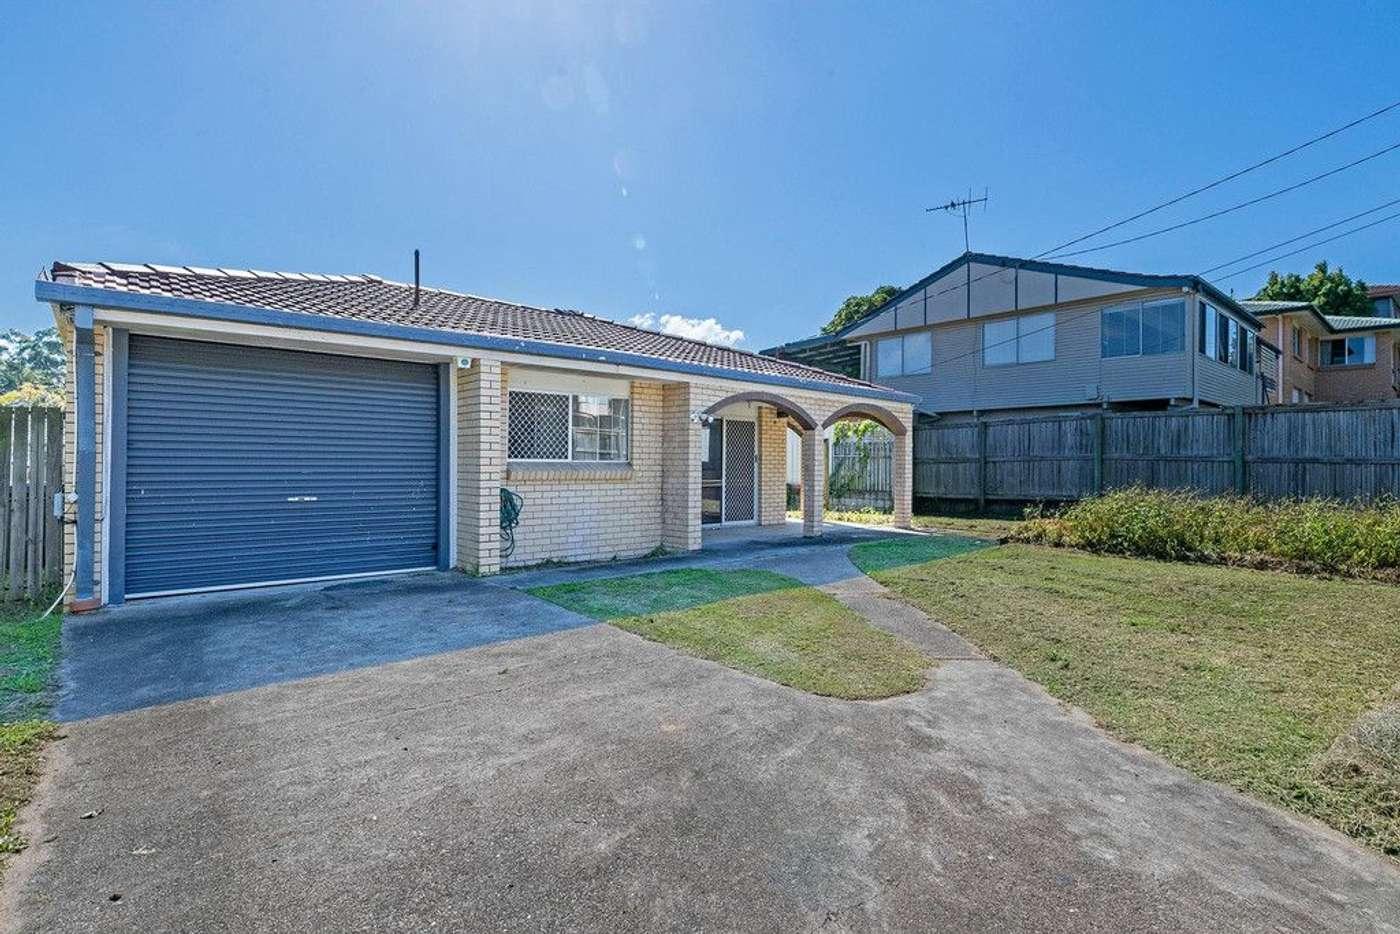 Main view of Homely house listing, 115 Gaynesford Street, Mount Gravatt QLD 4122